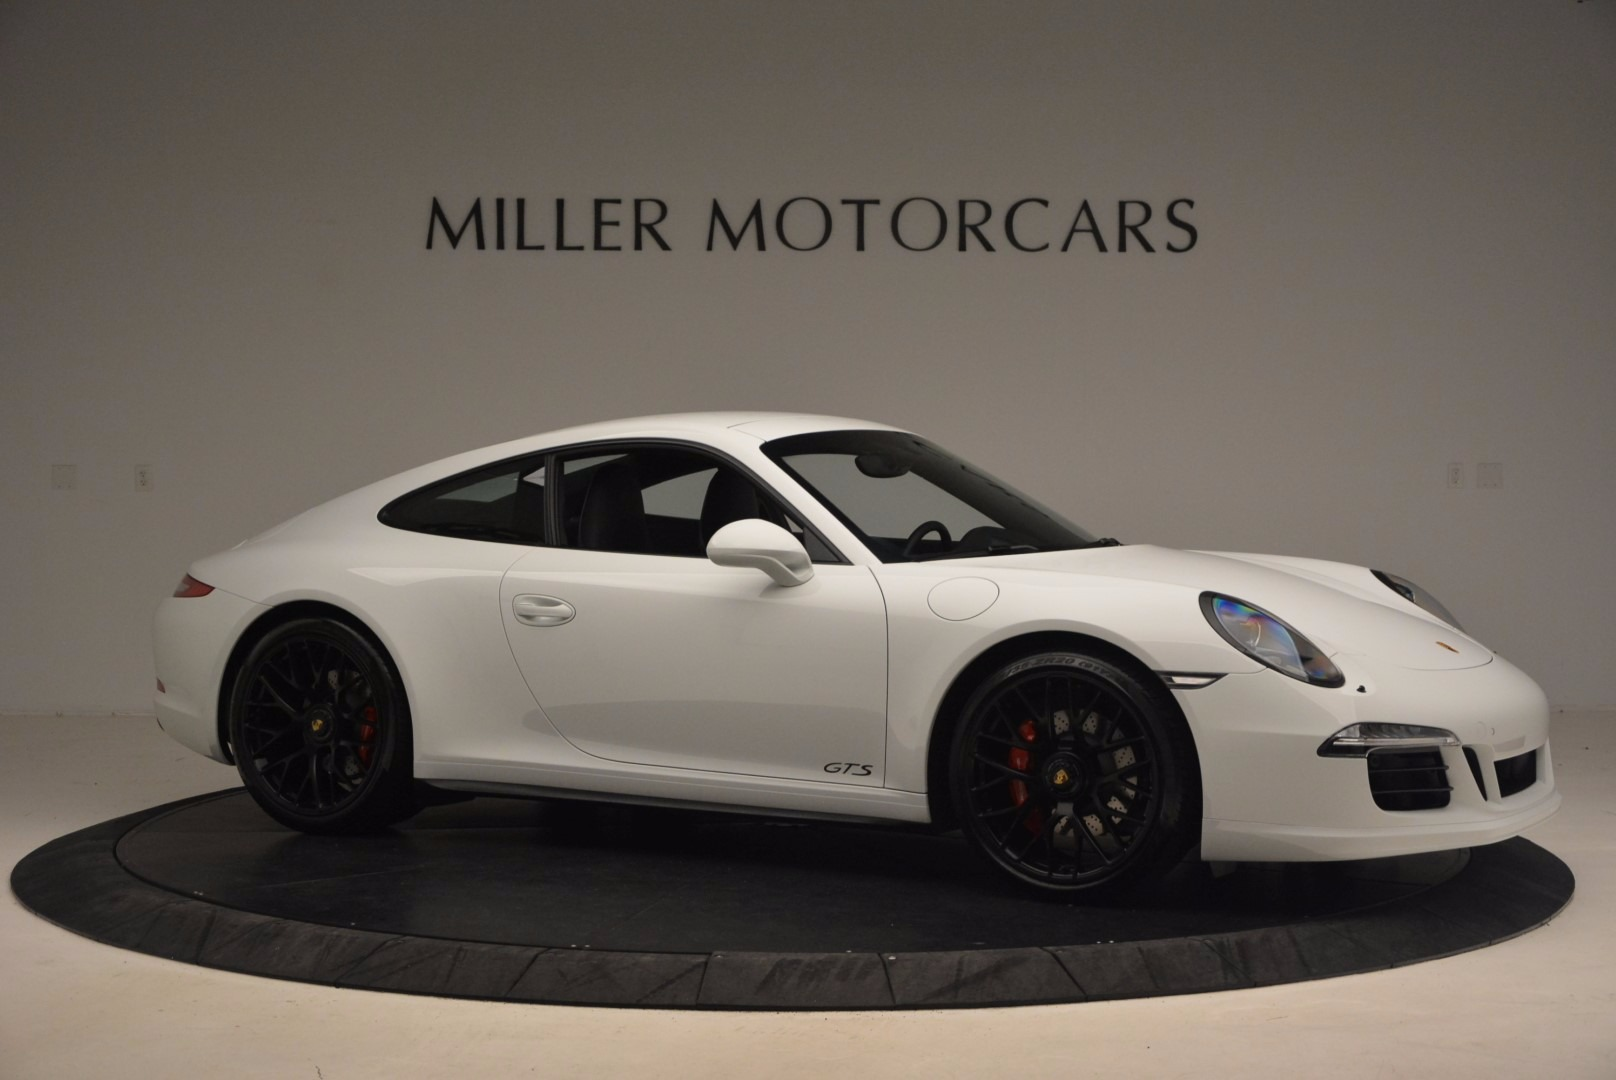 Used 2015 Porsche 911 Carrera GTS For Sale In Greenwich, CT 1444_p10